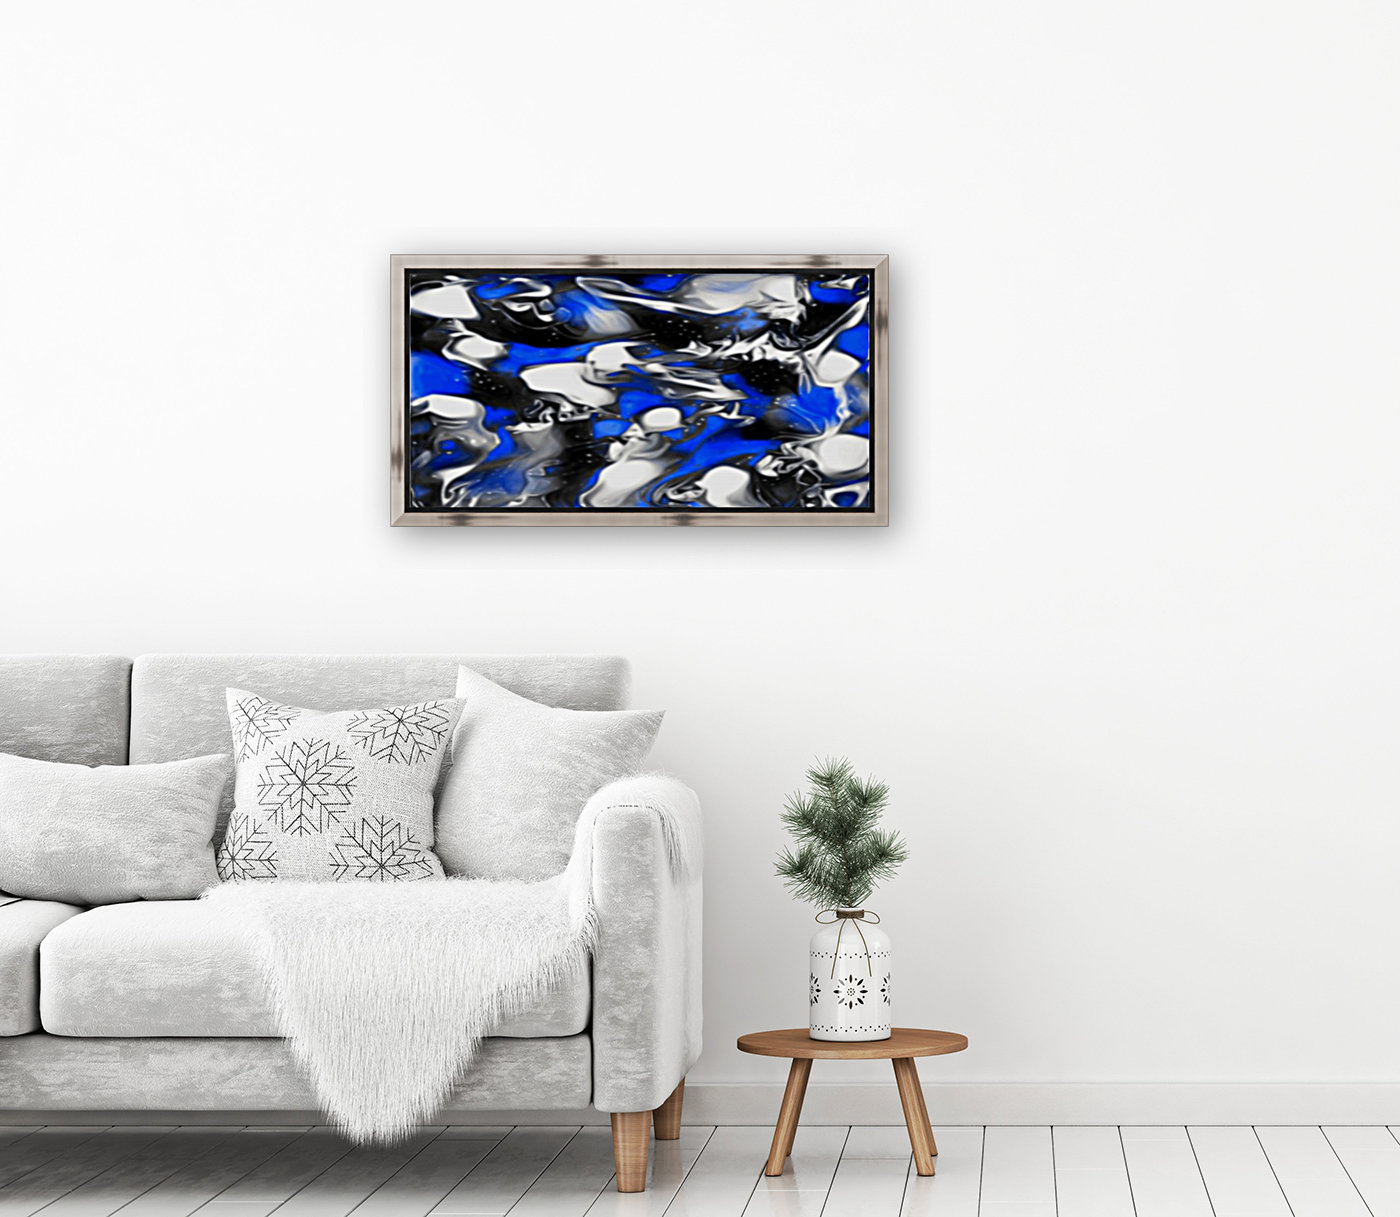 Booster - blue white black silver spots swirls abstract wall art  Art